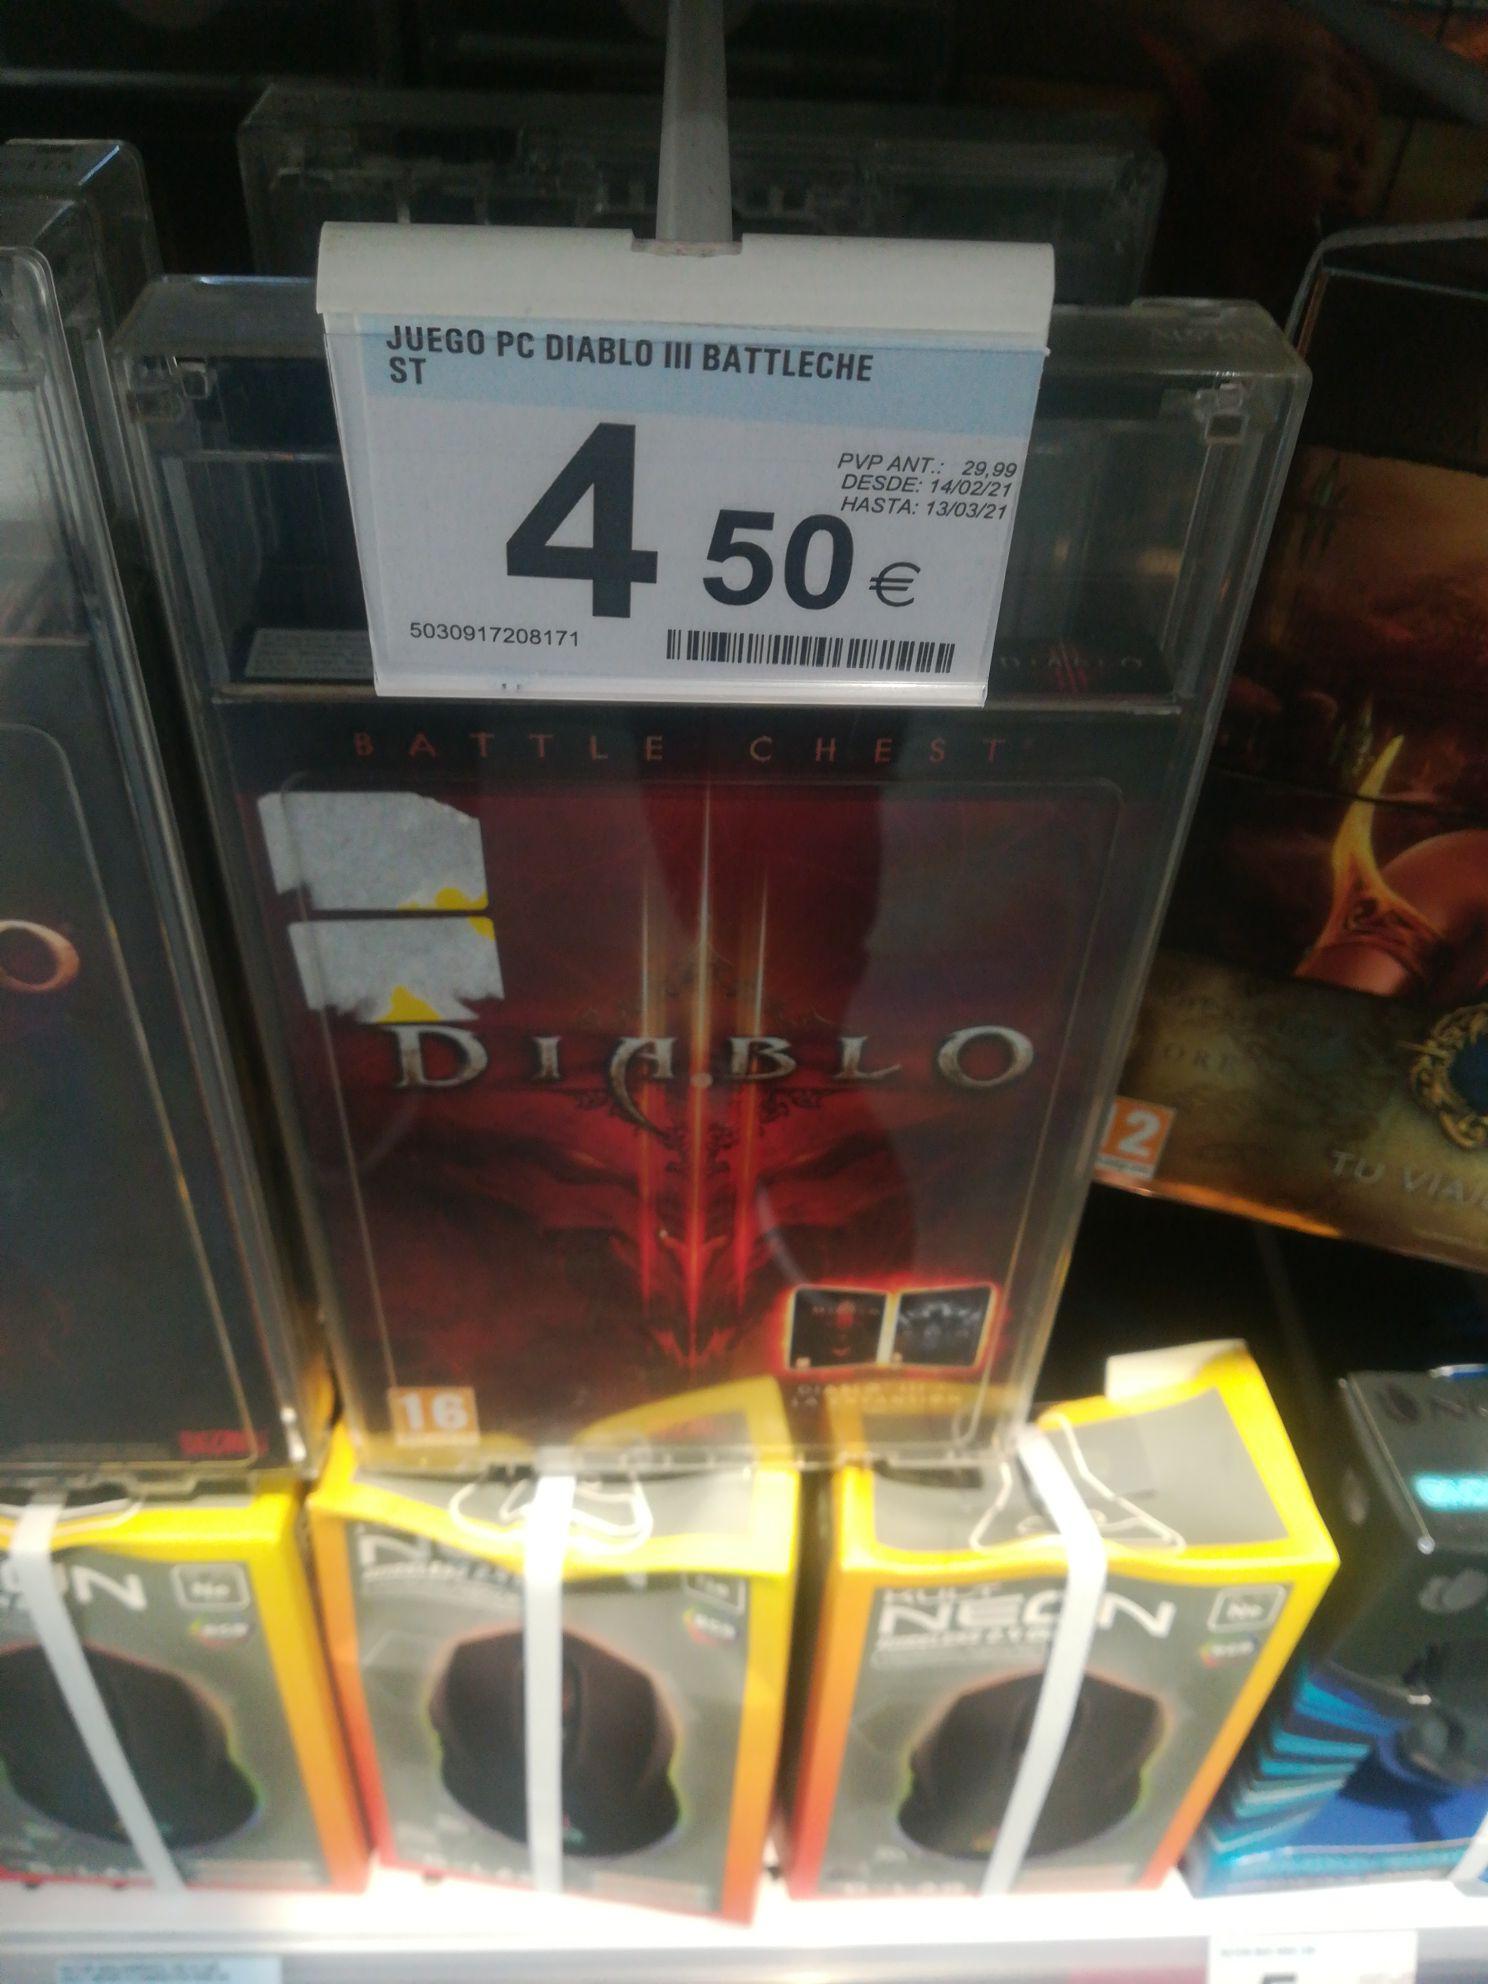 Diablo 3 Battle Chest a mitad de precio Carrefour Oiartzun